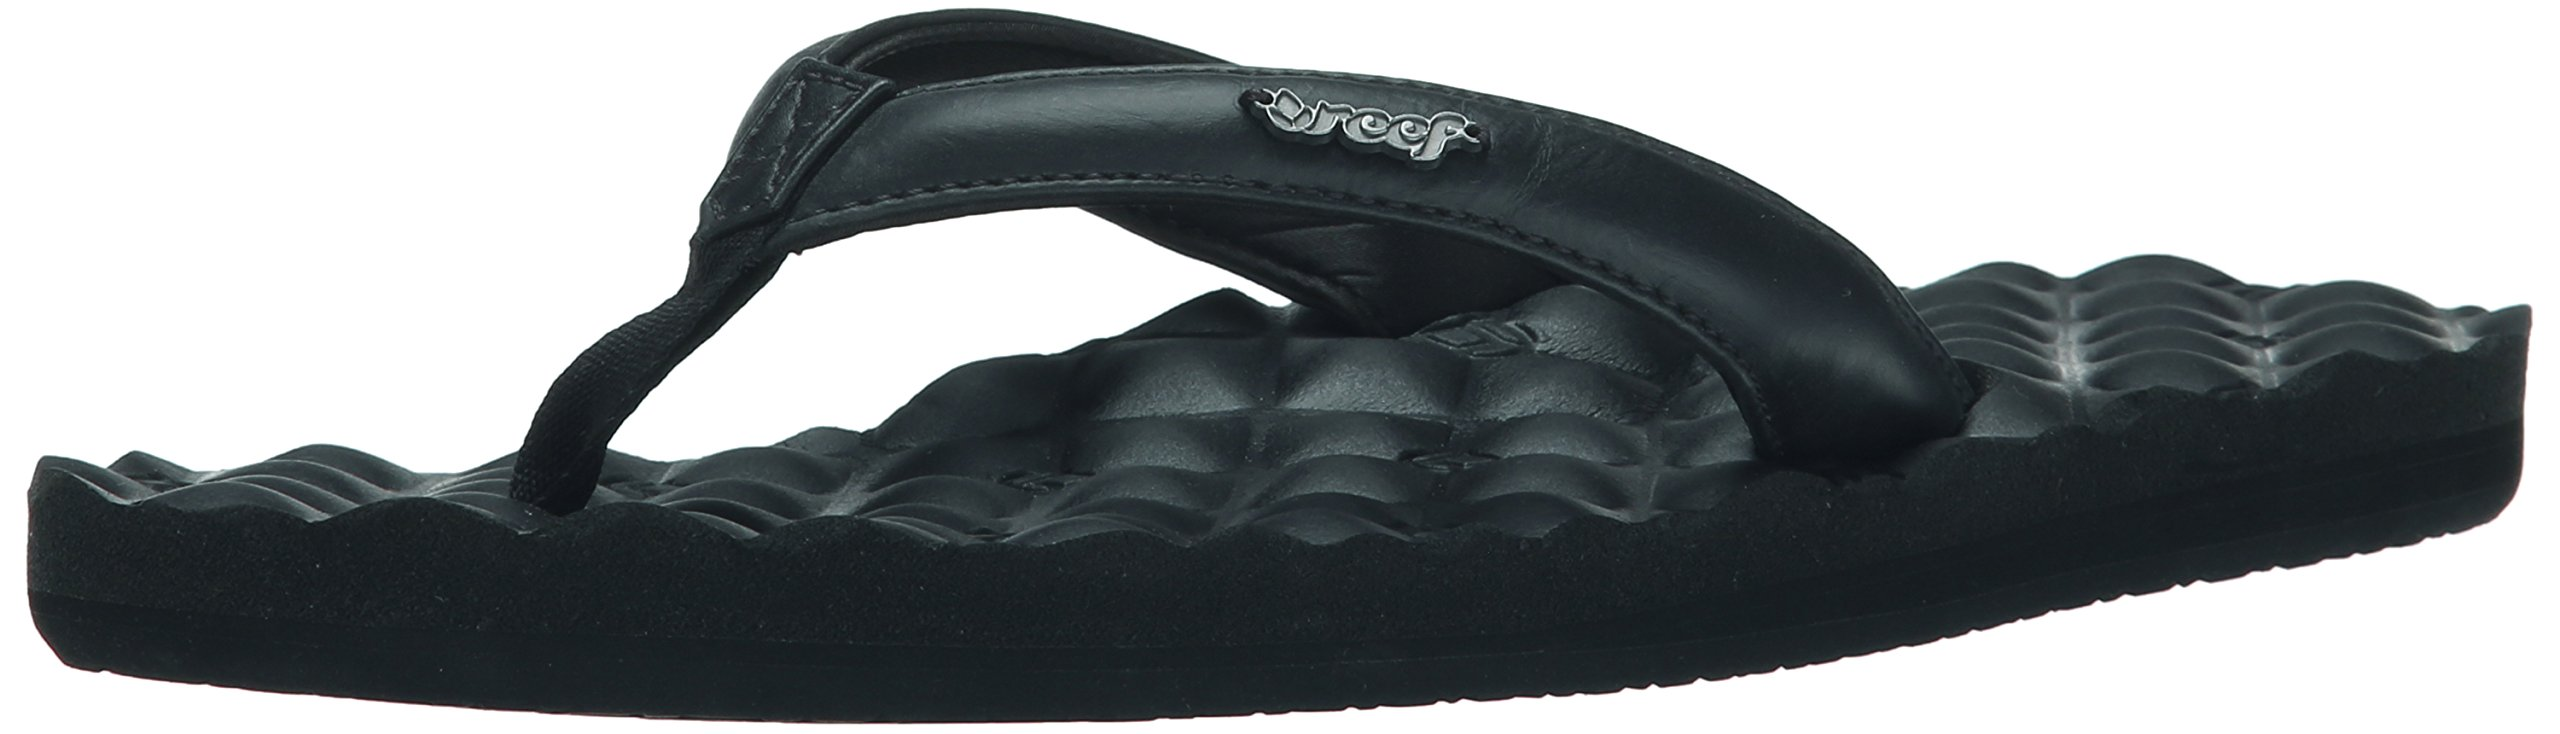 Reef Women's Dreams Sandal,  Black, 8 B(M) US